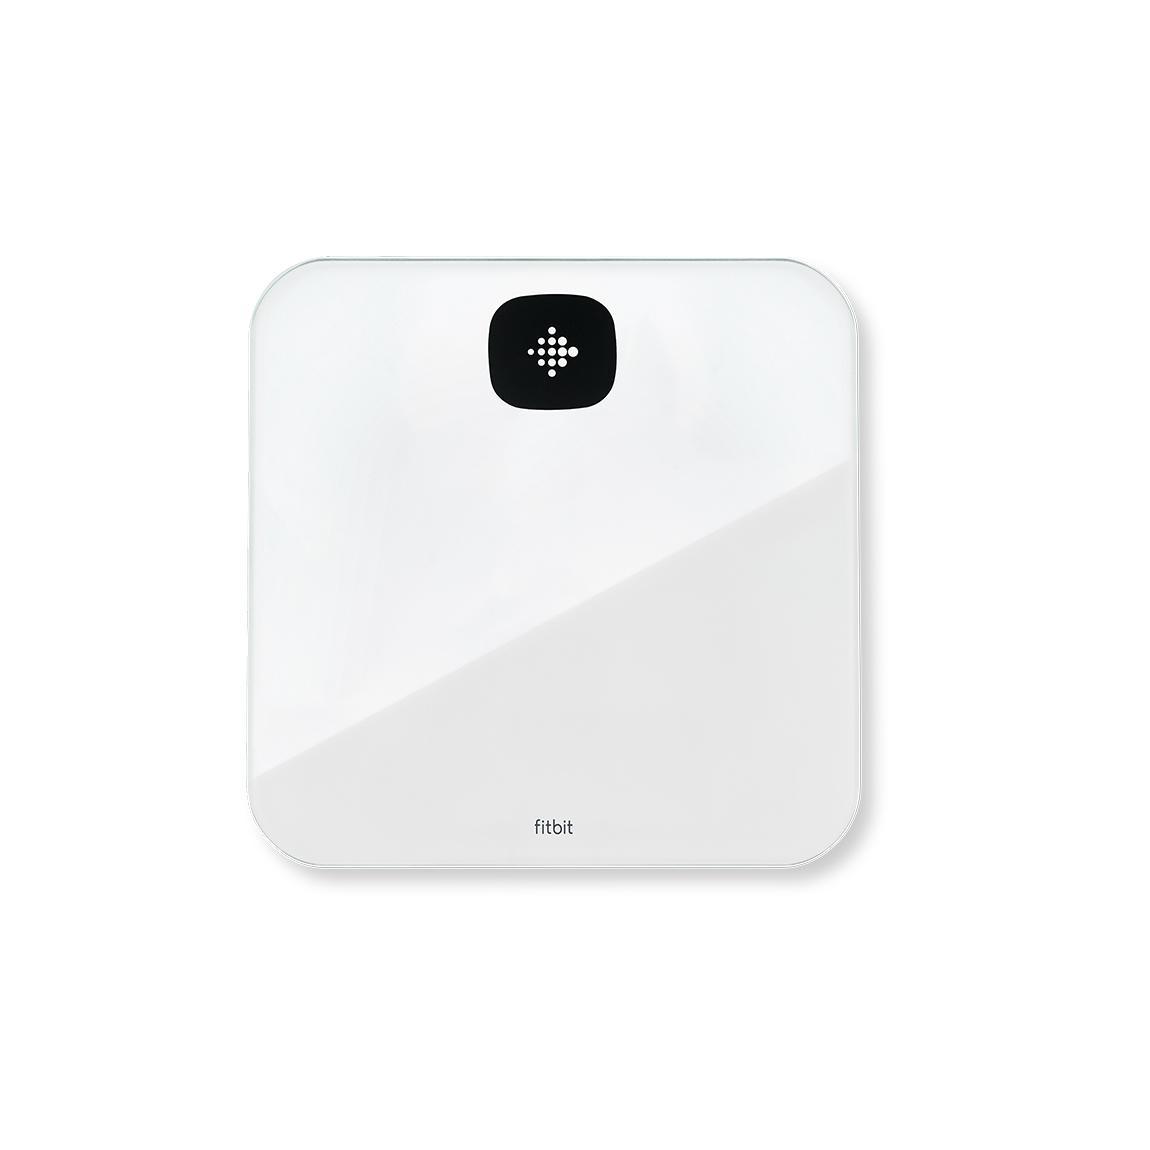 Fitbit Aria Air - Bluetooth-Waage - Weiß